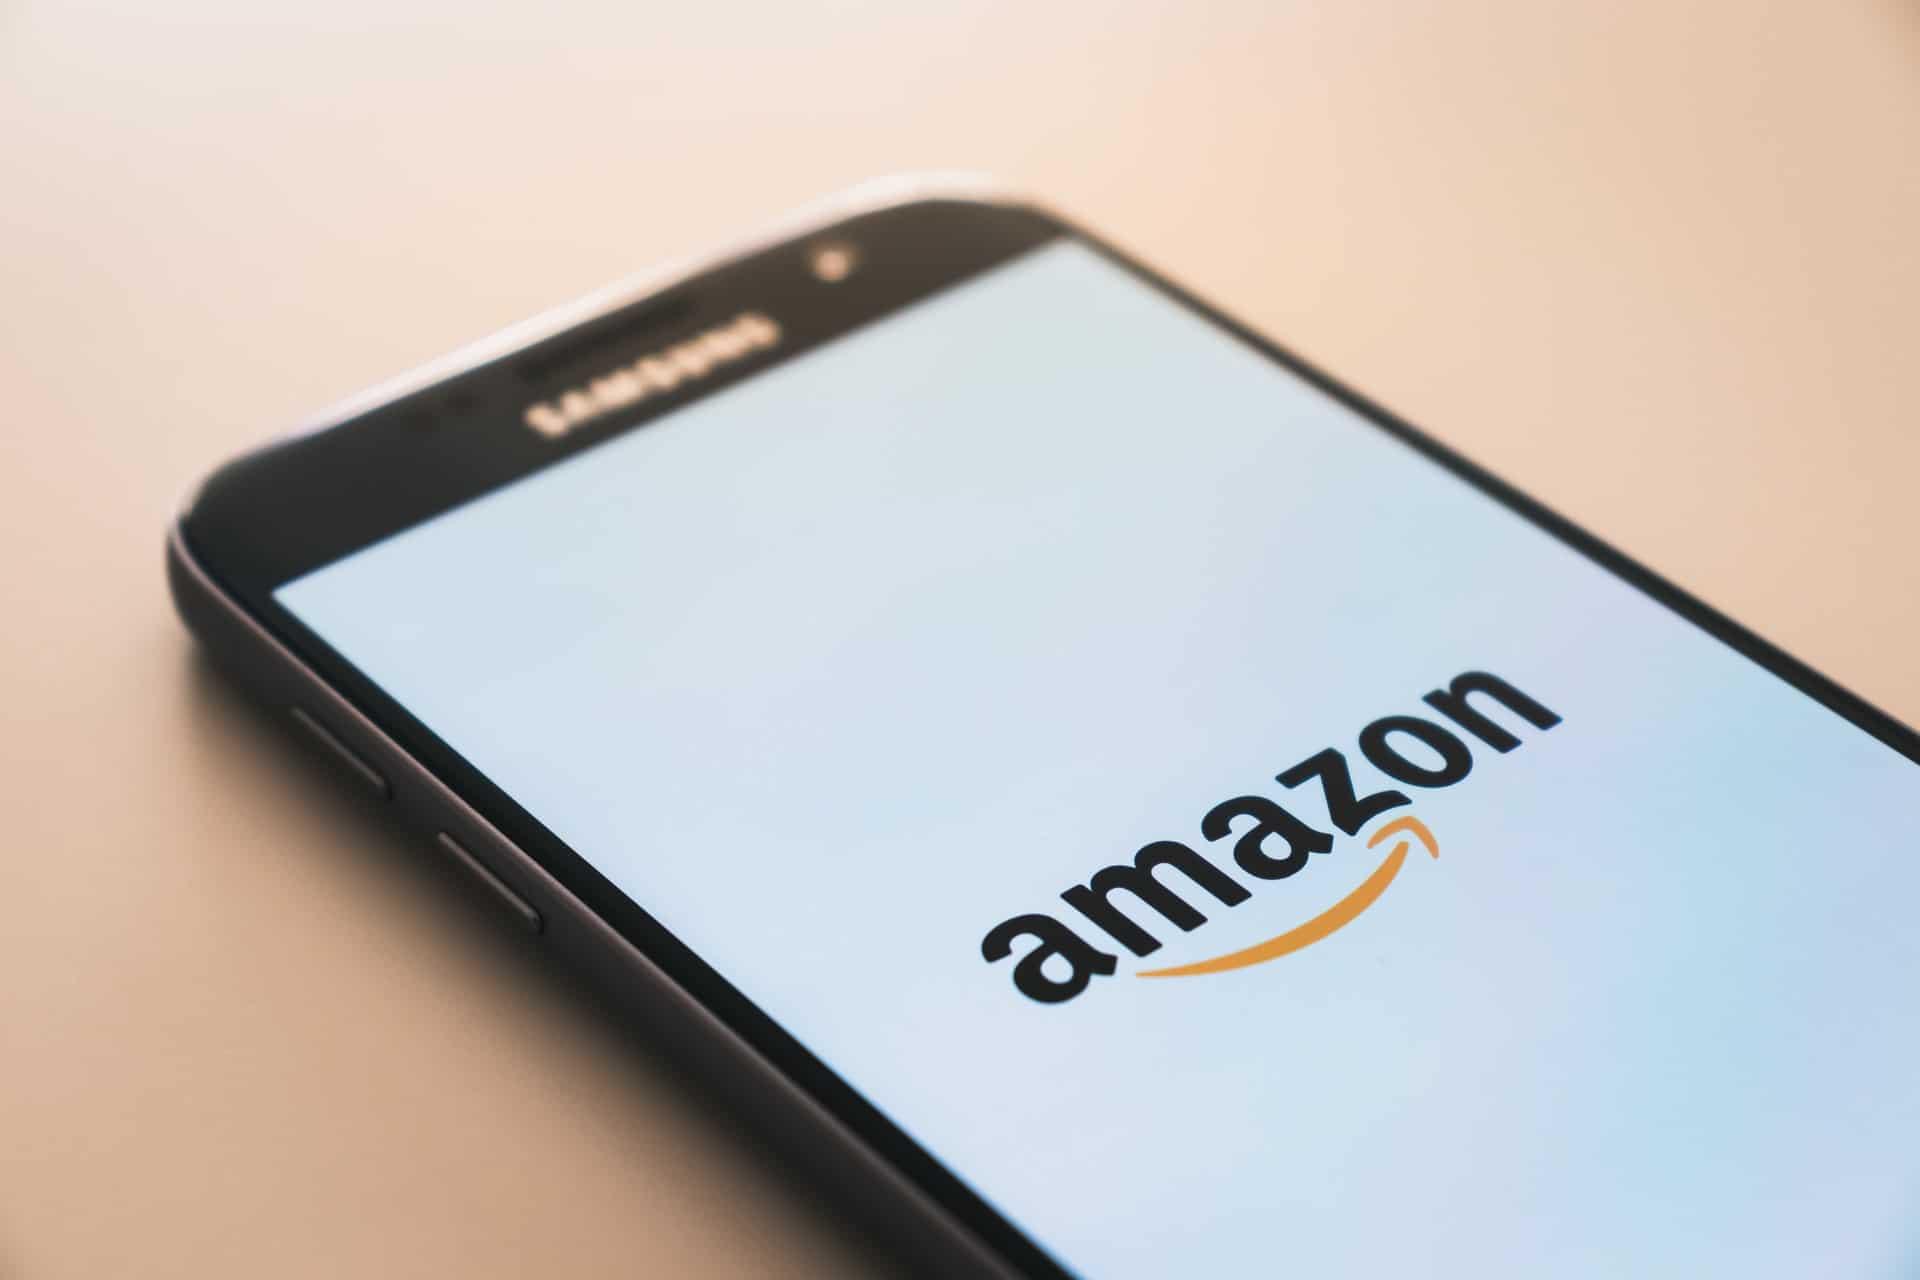 Amazon logo on phone